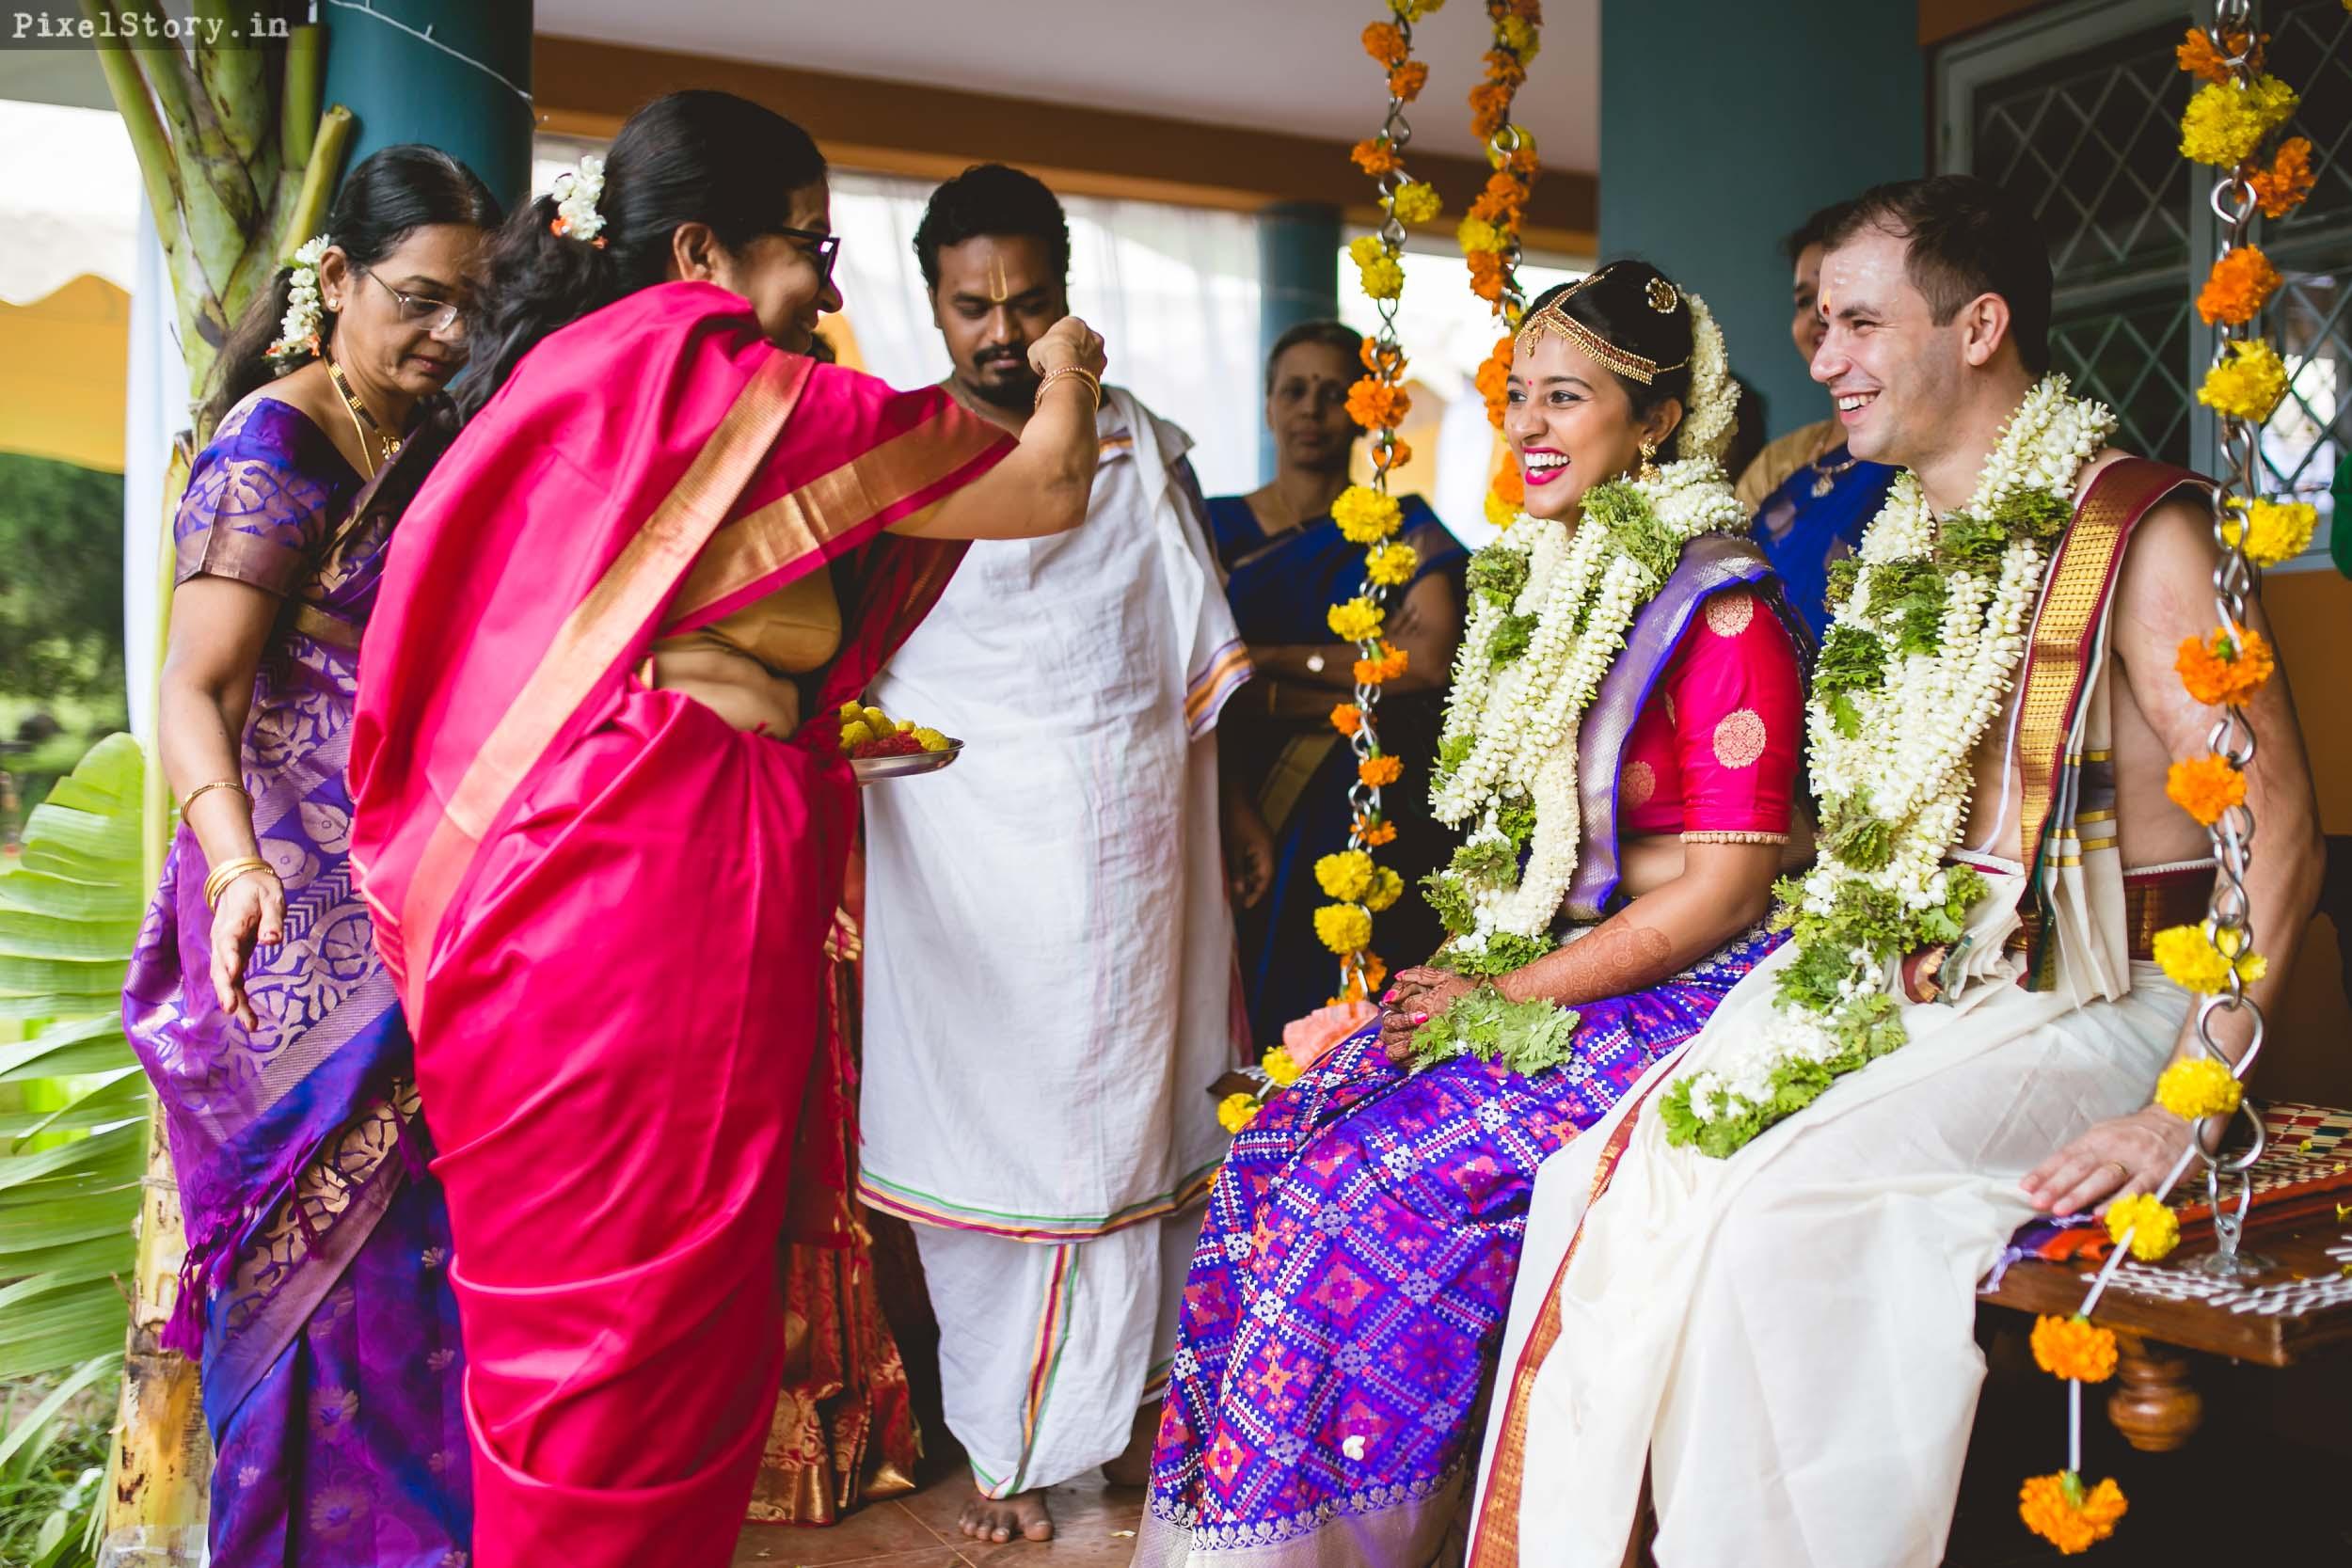 PixelStory-Jungle-Wedding-Photographer-Masinagudi-Indo-French041.jpg